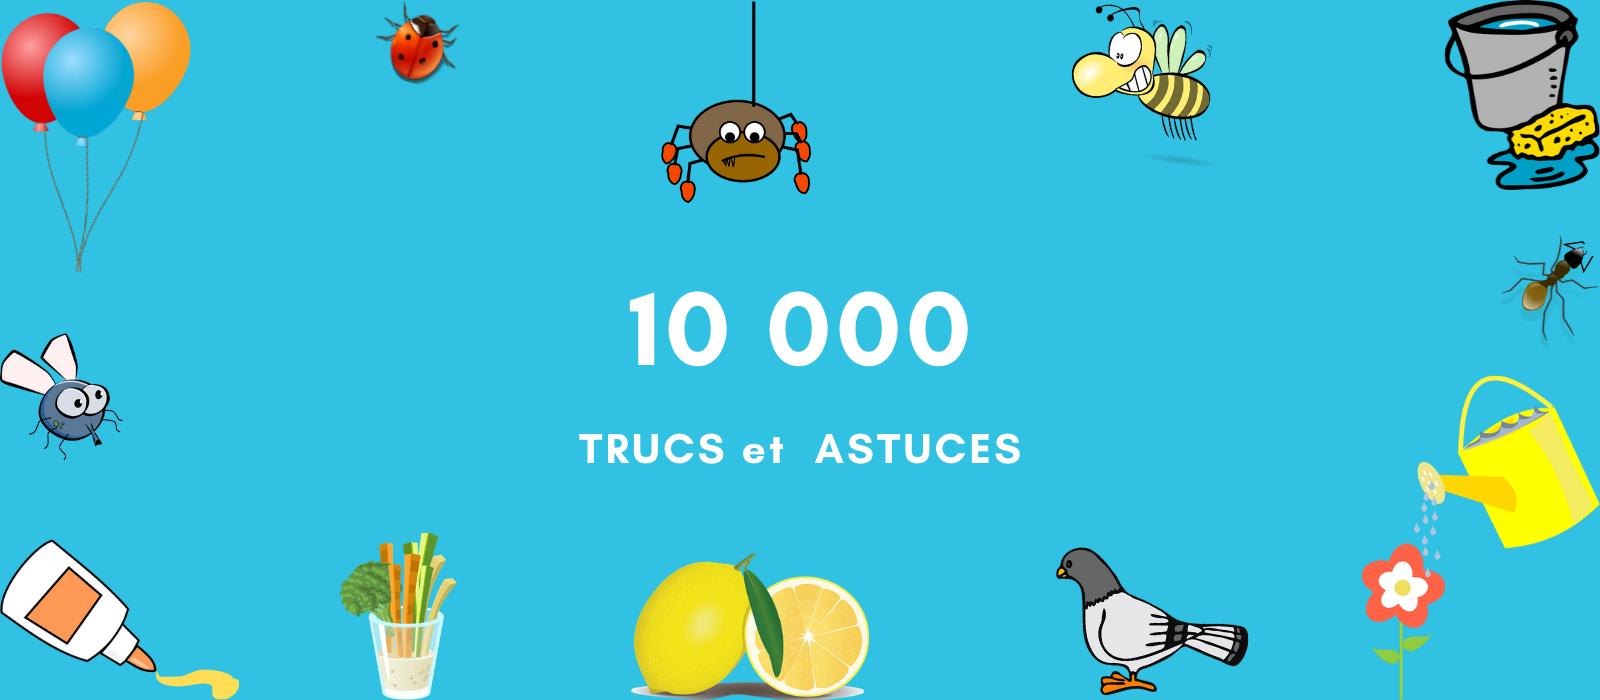 10000 trucs et astcues sur 10-trucs.com